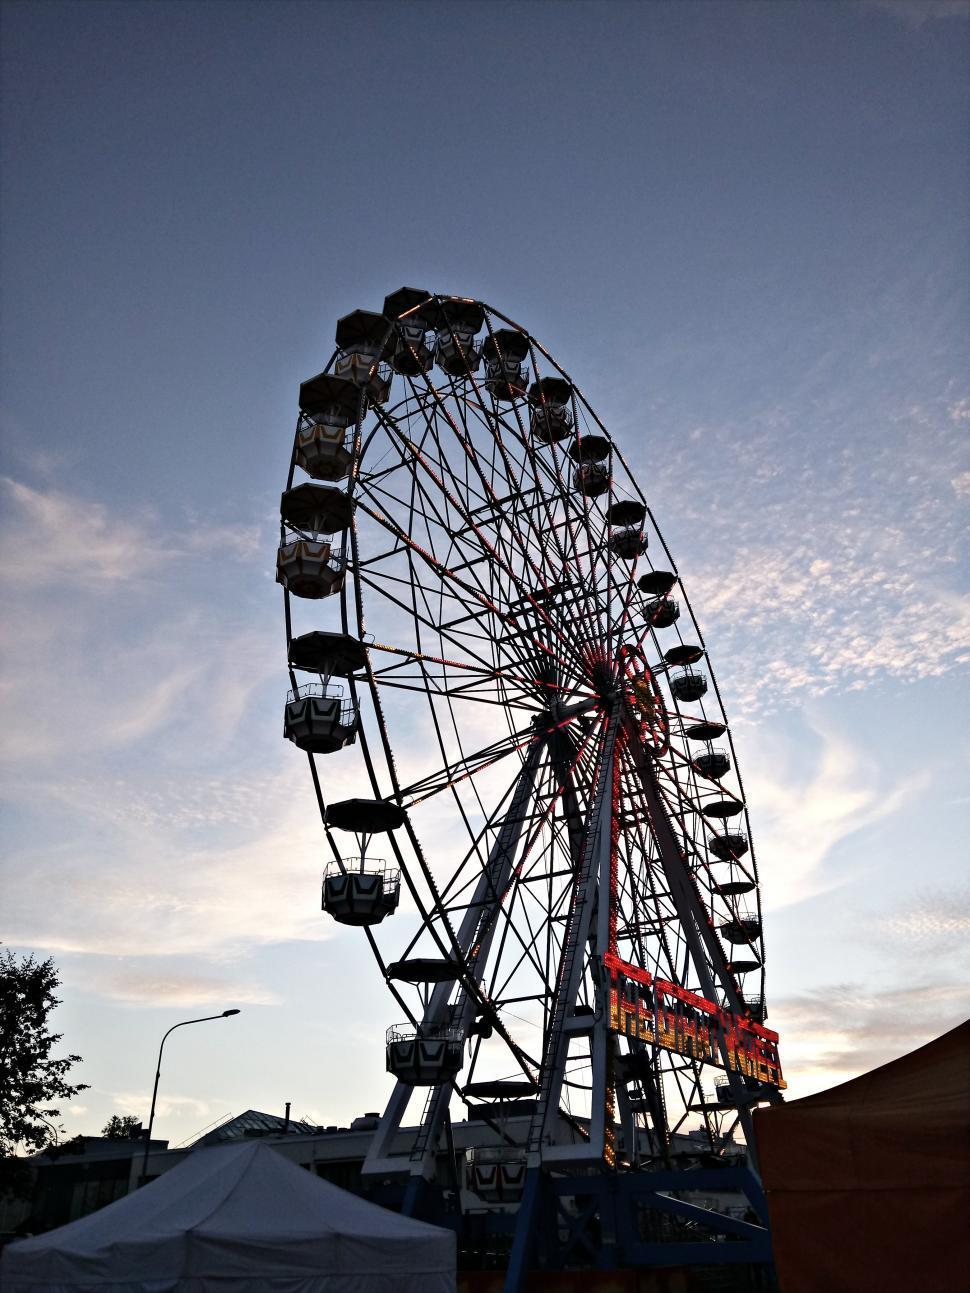 Download Free Stock HD Photo of Ferris wheel silhouette Online